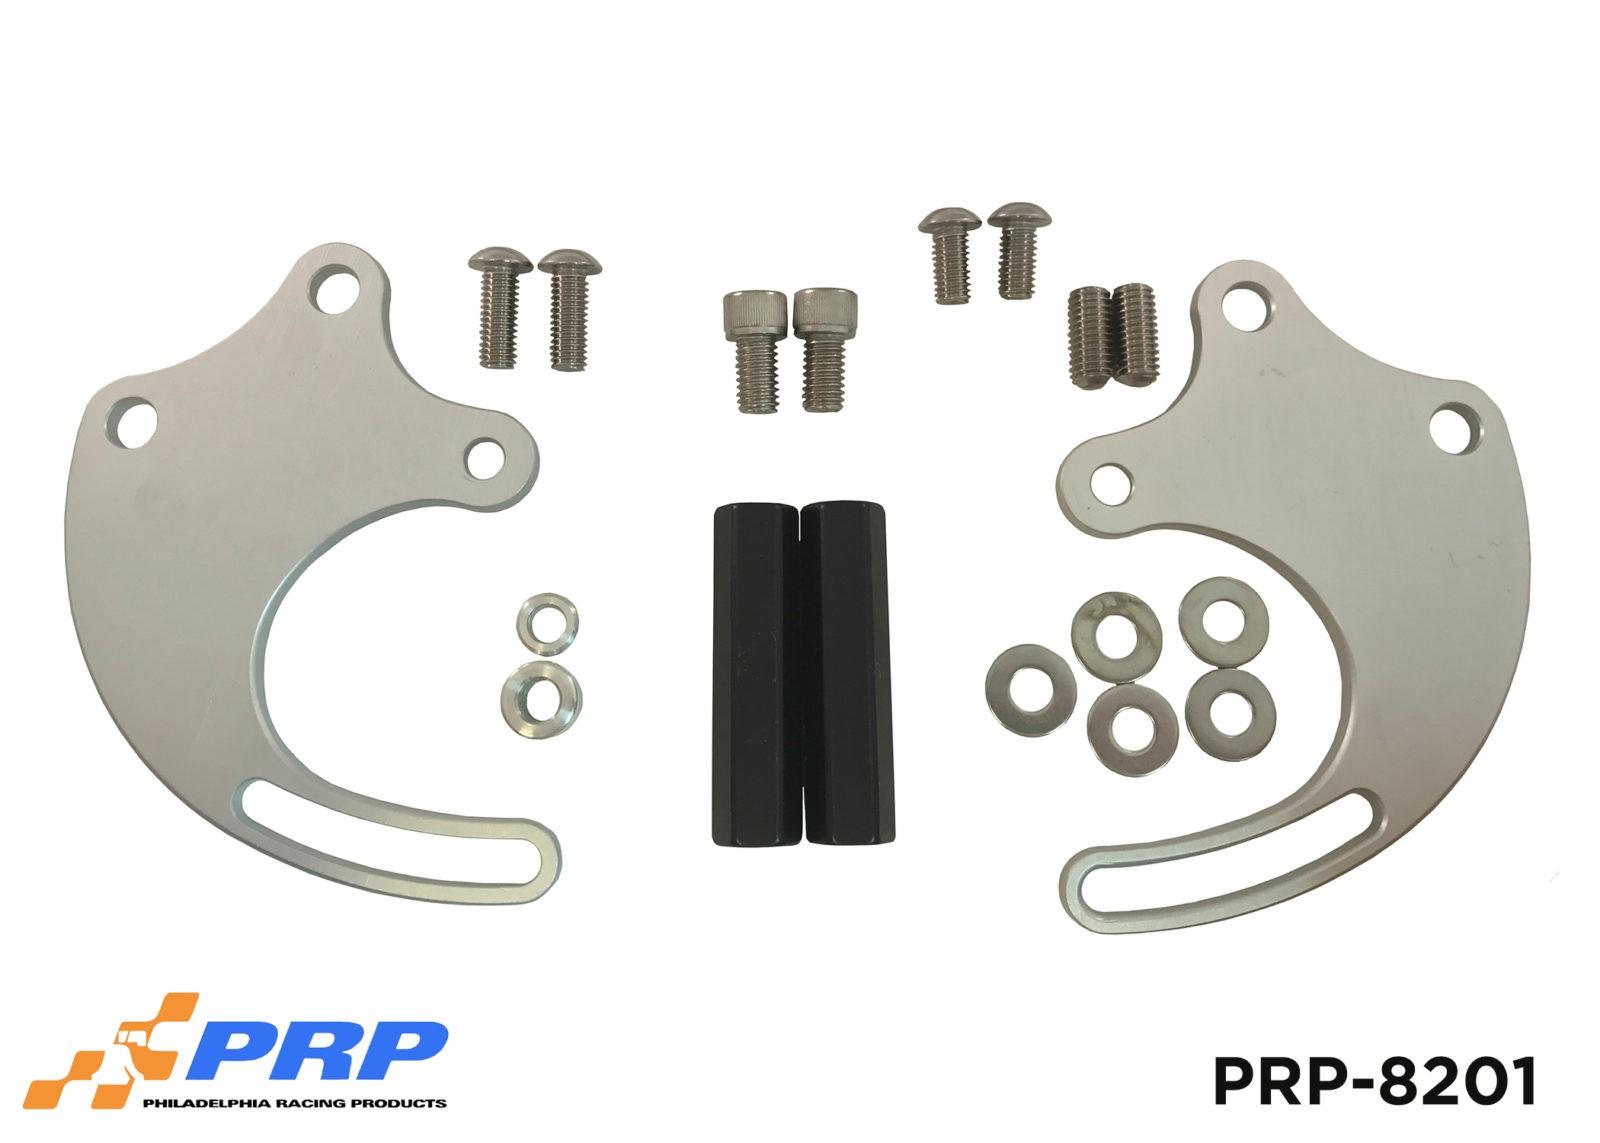 Silver and Black Power Steering Pump Mounting Bracket Kits